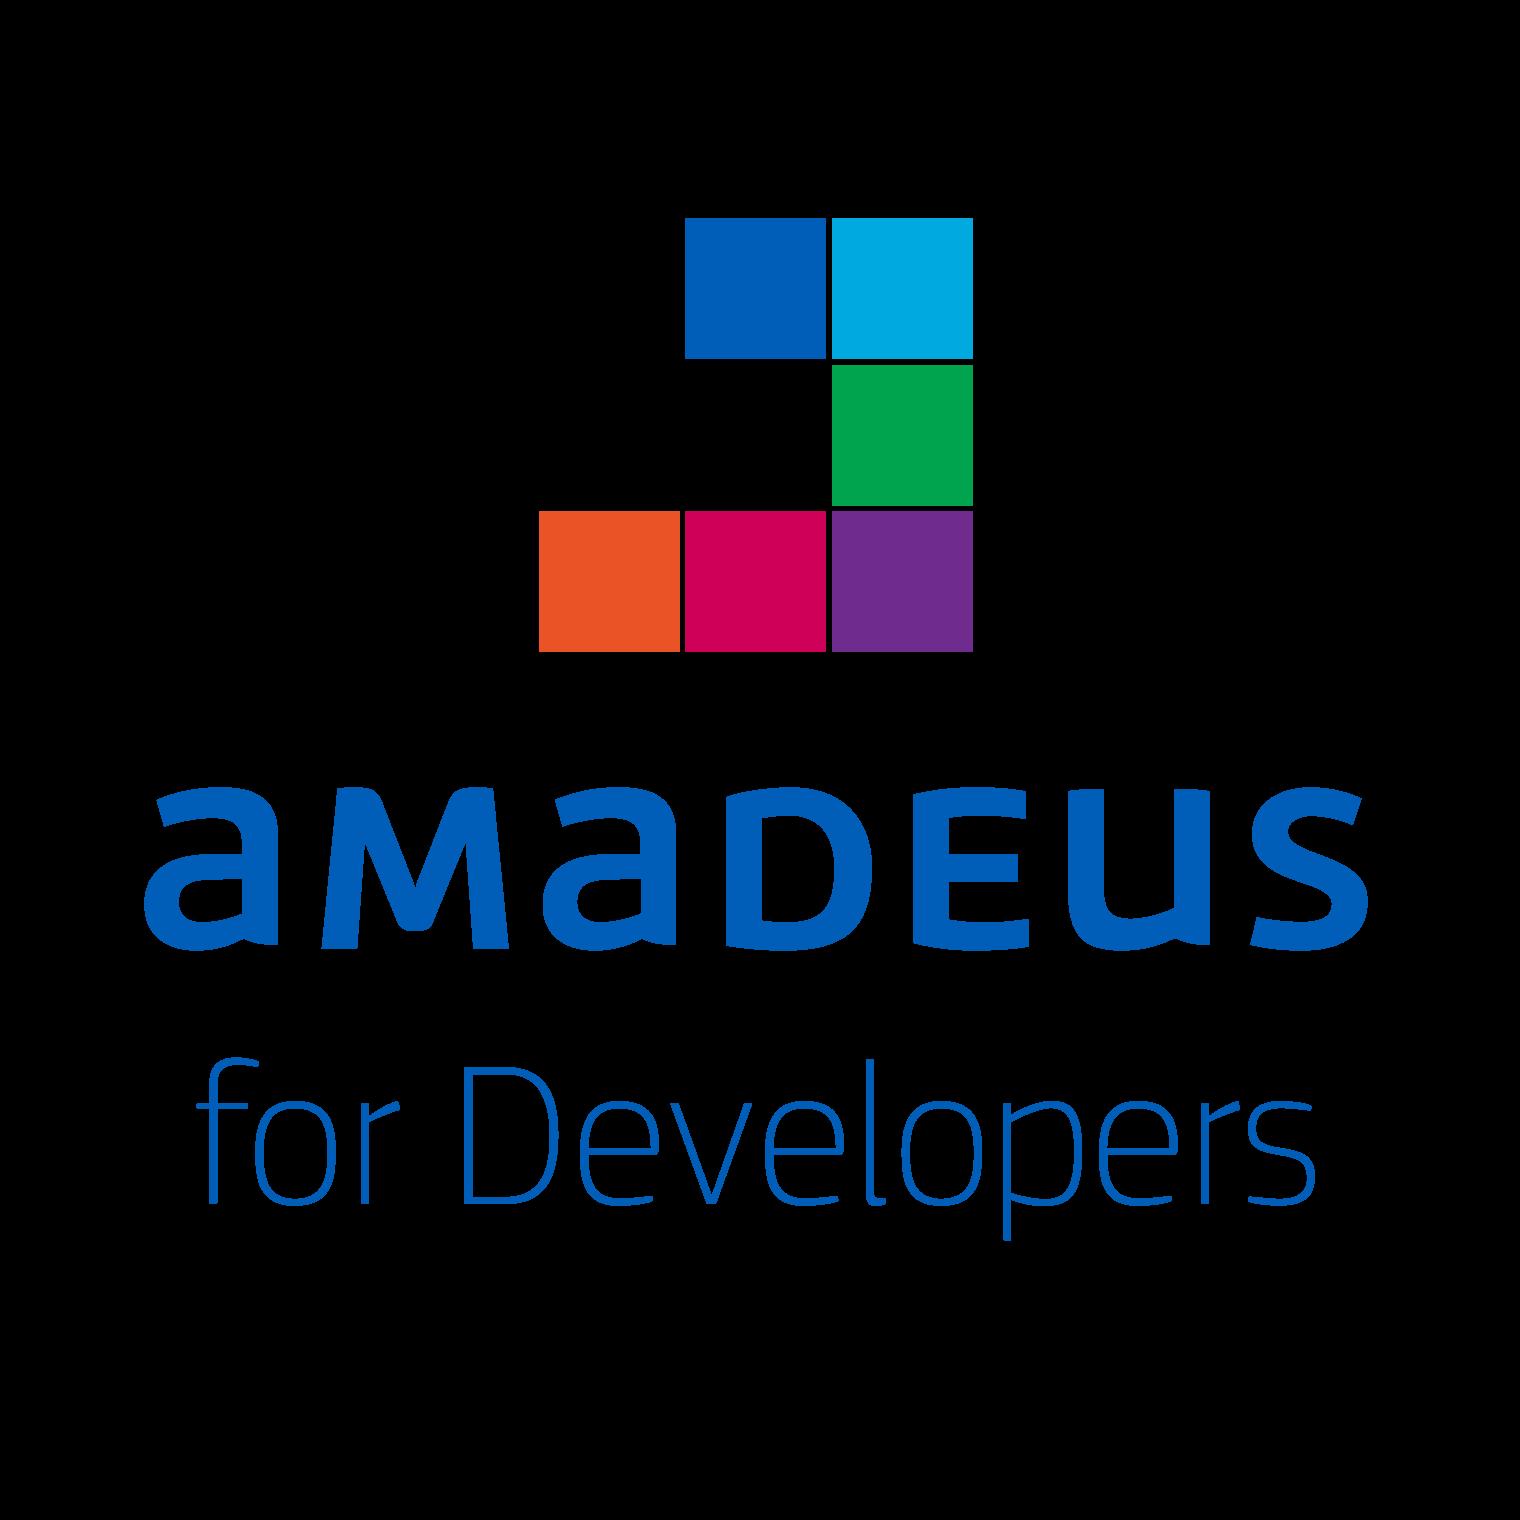 Amadeus for Developers logo